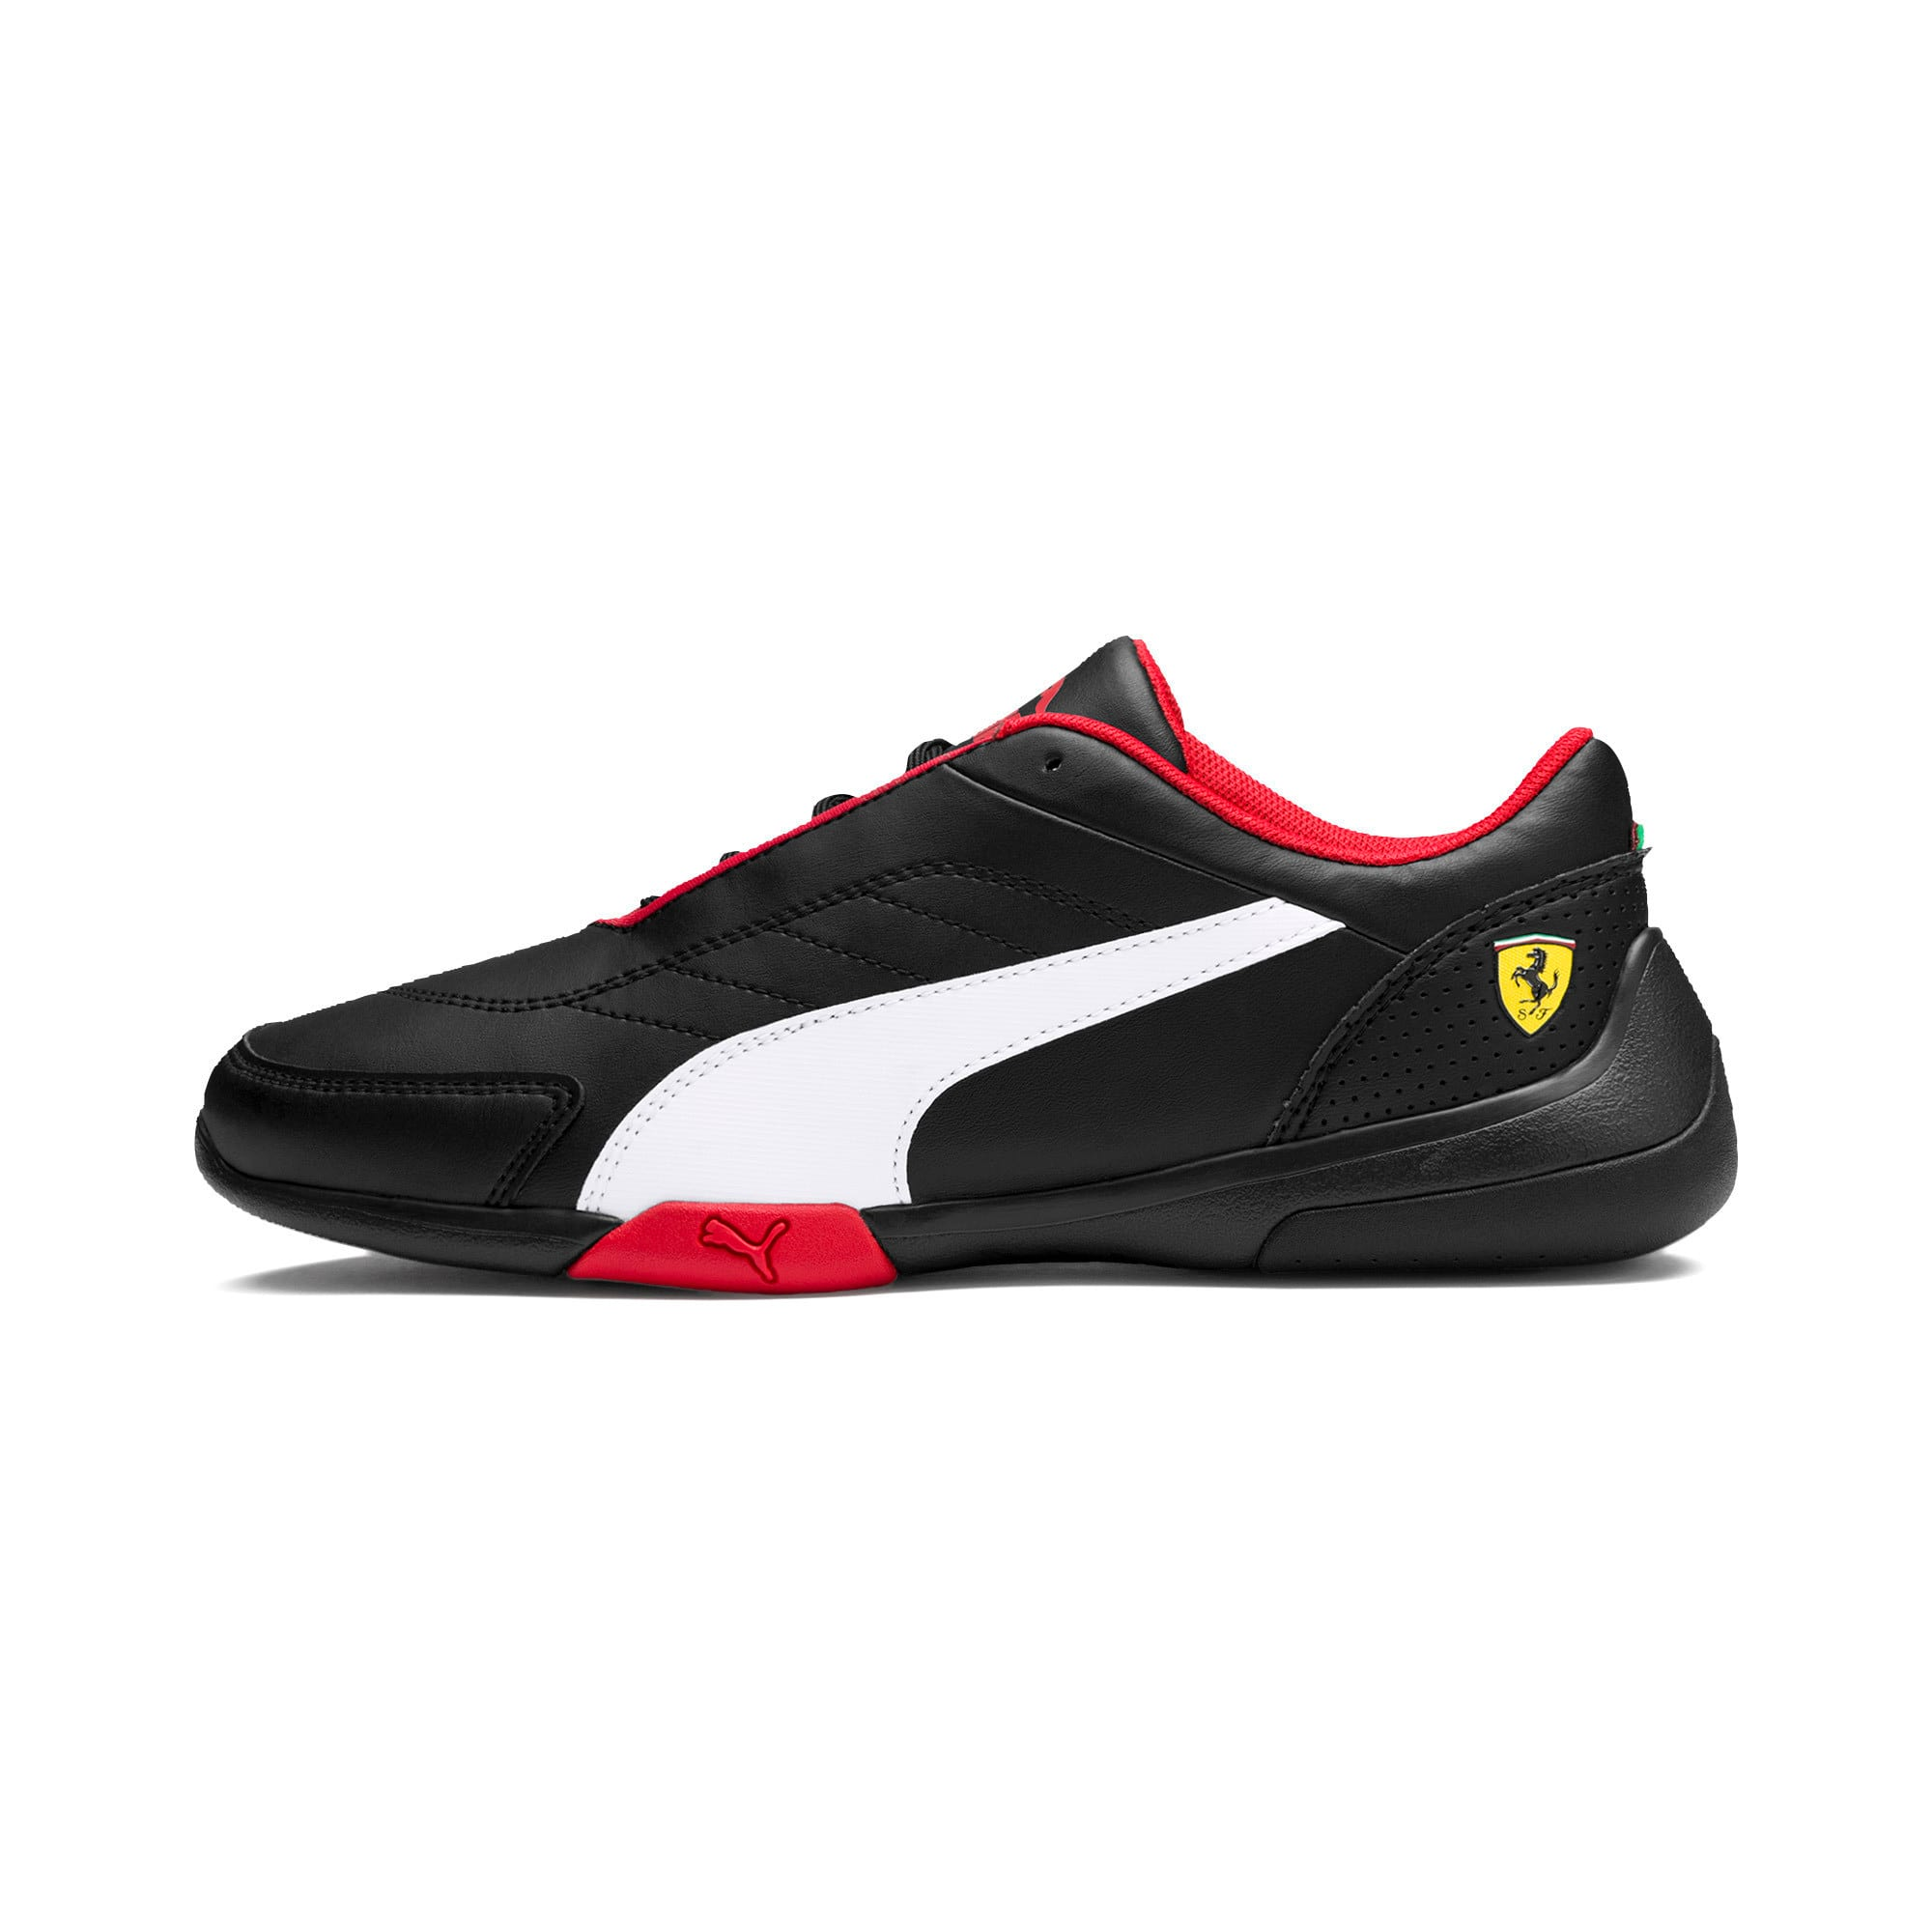 Thumbnail 1 of Scuderia Ferrari Kart Cat III Shoes, Puma Black-Puma White, medium